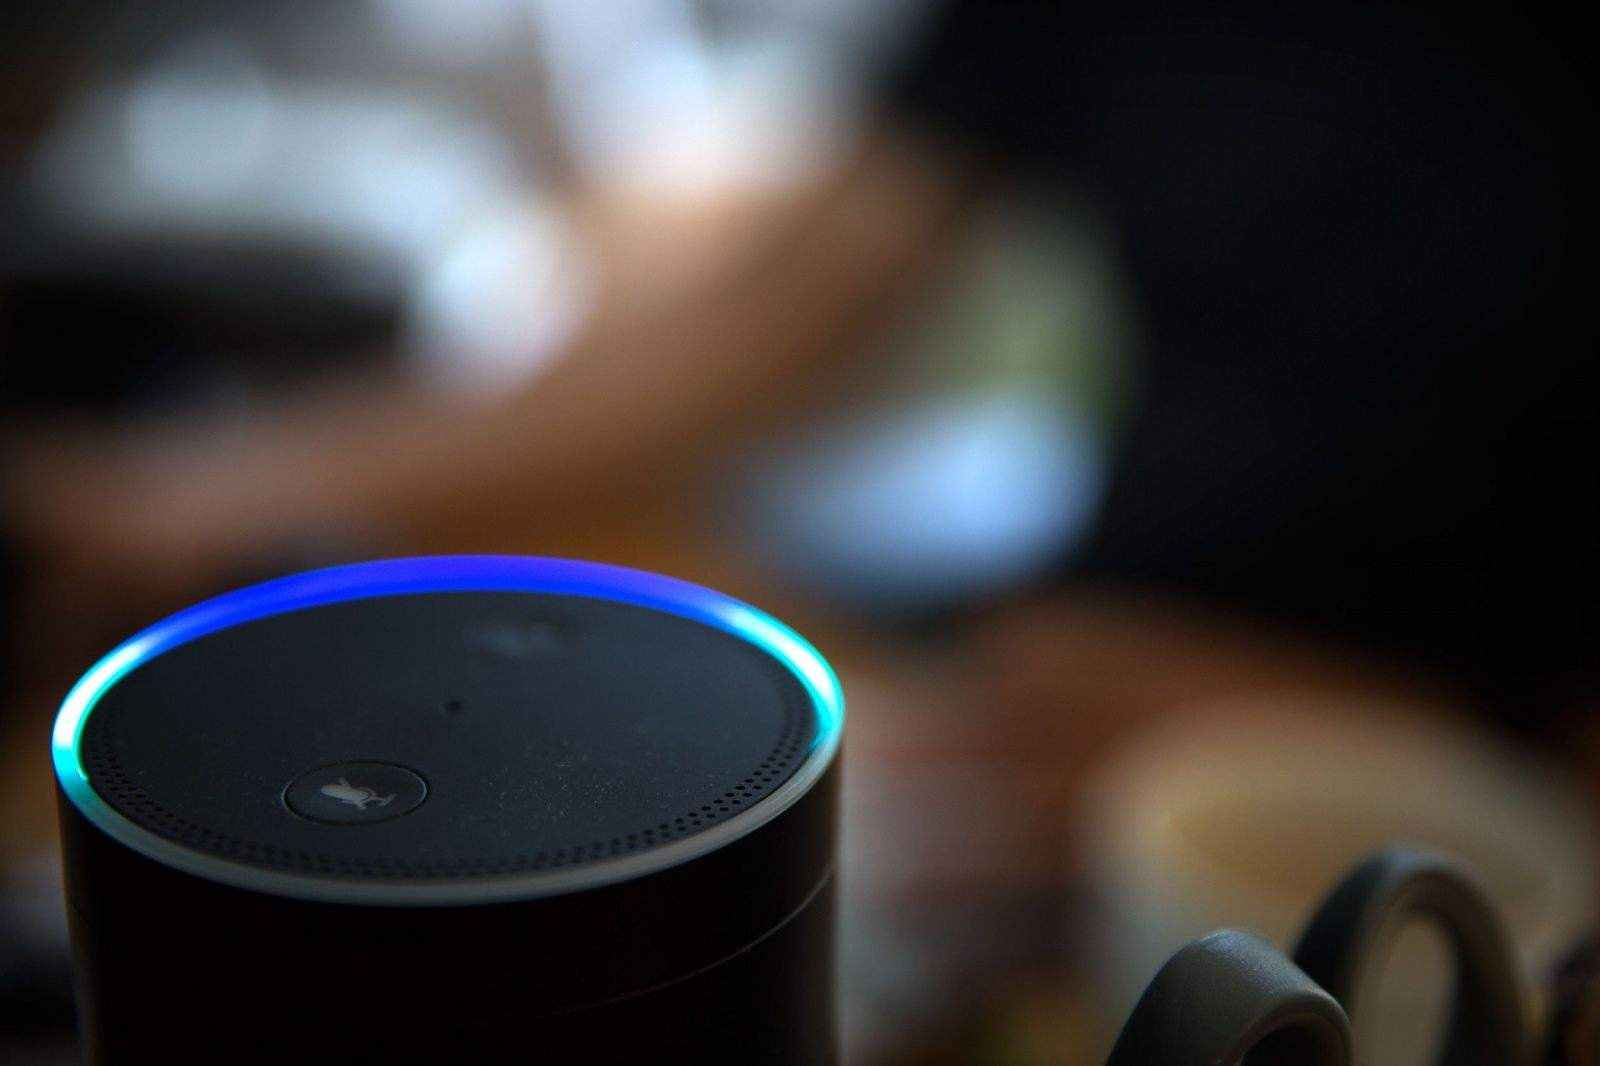 Amazon's Echo and Alexa, helping us rhyme since 2016. Photo: Jim Merithew/Cult of Mac